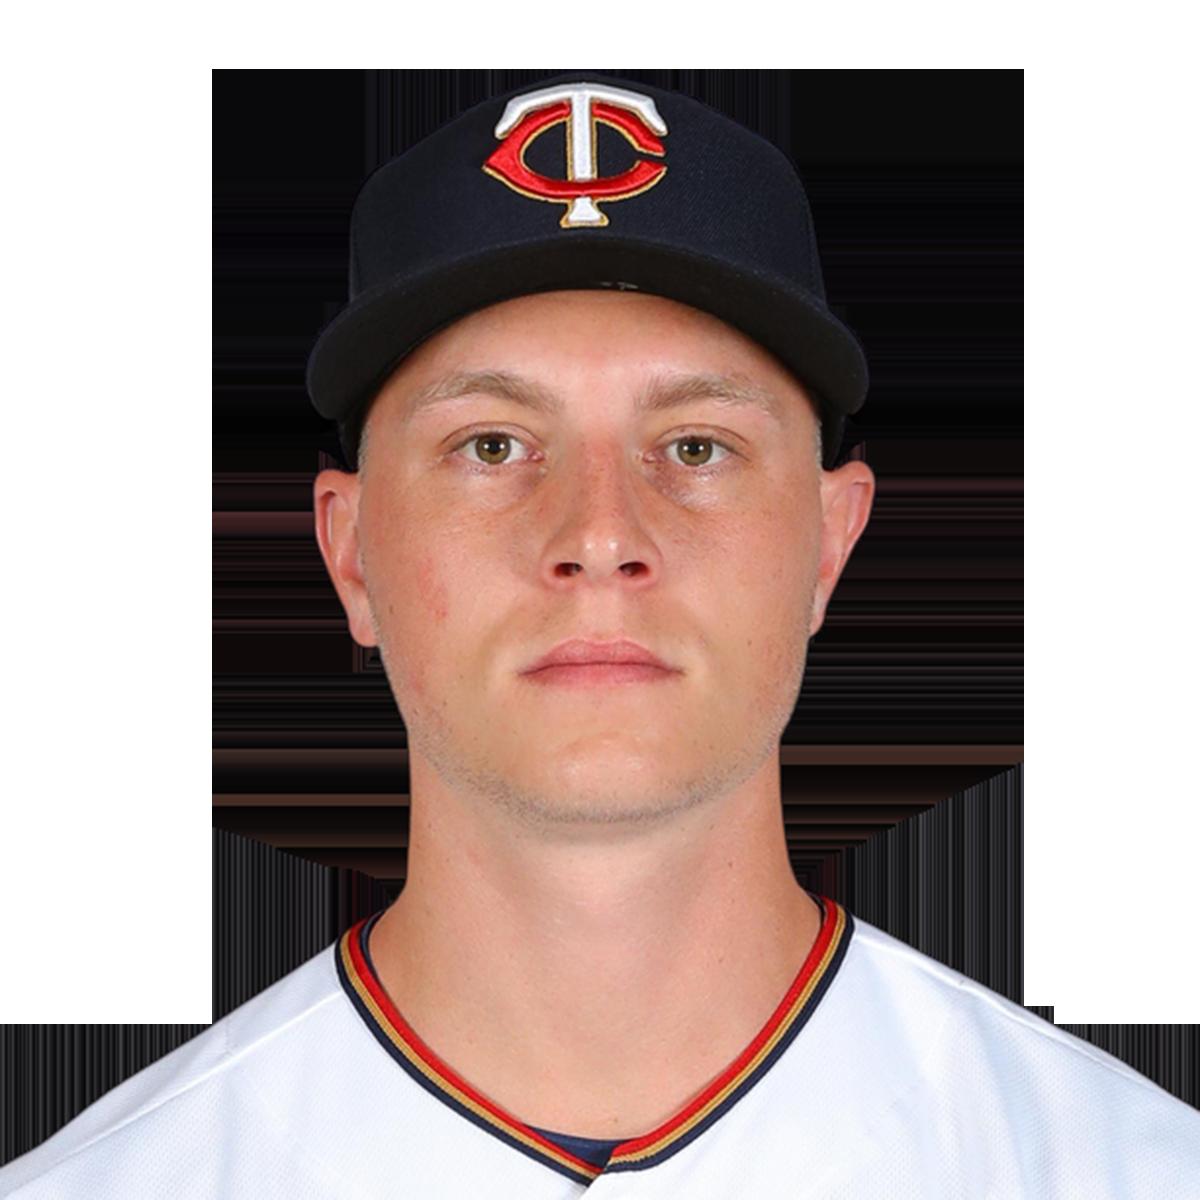 Cody Stashak